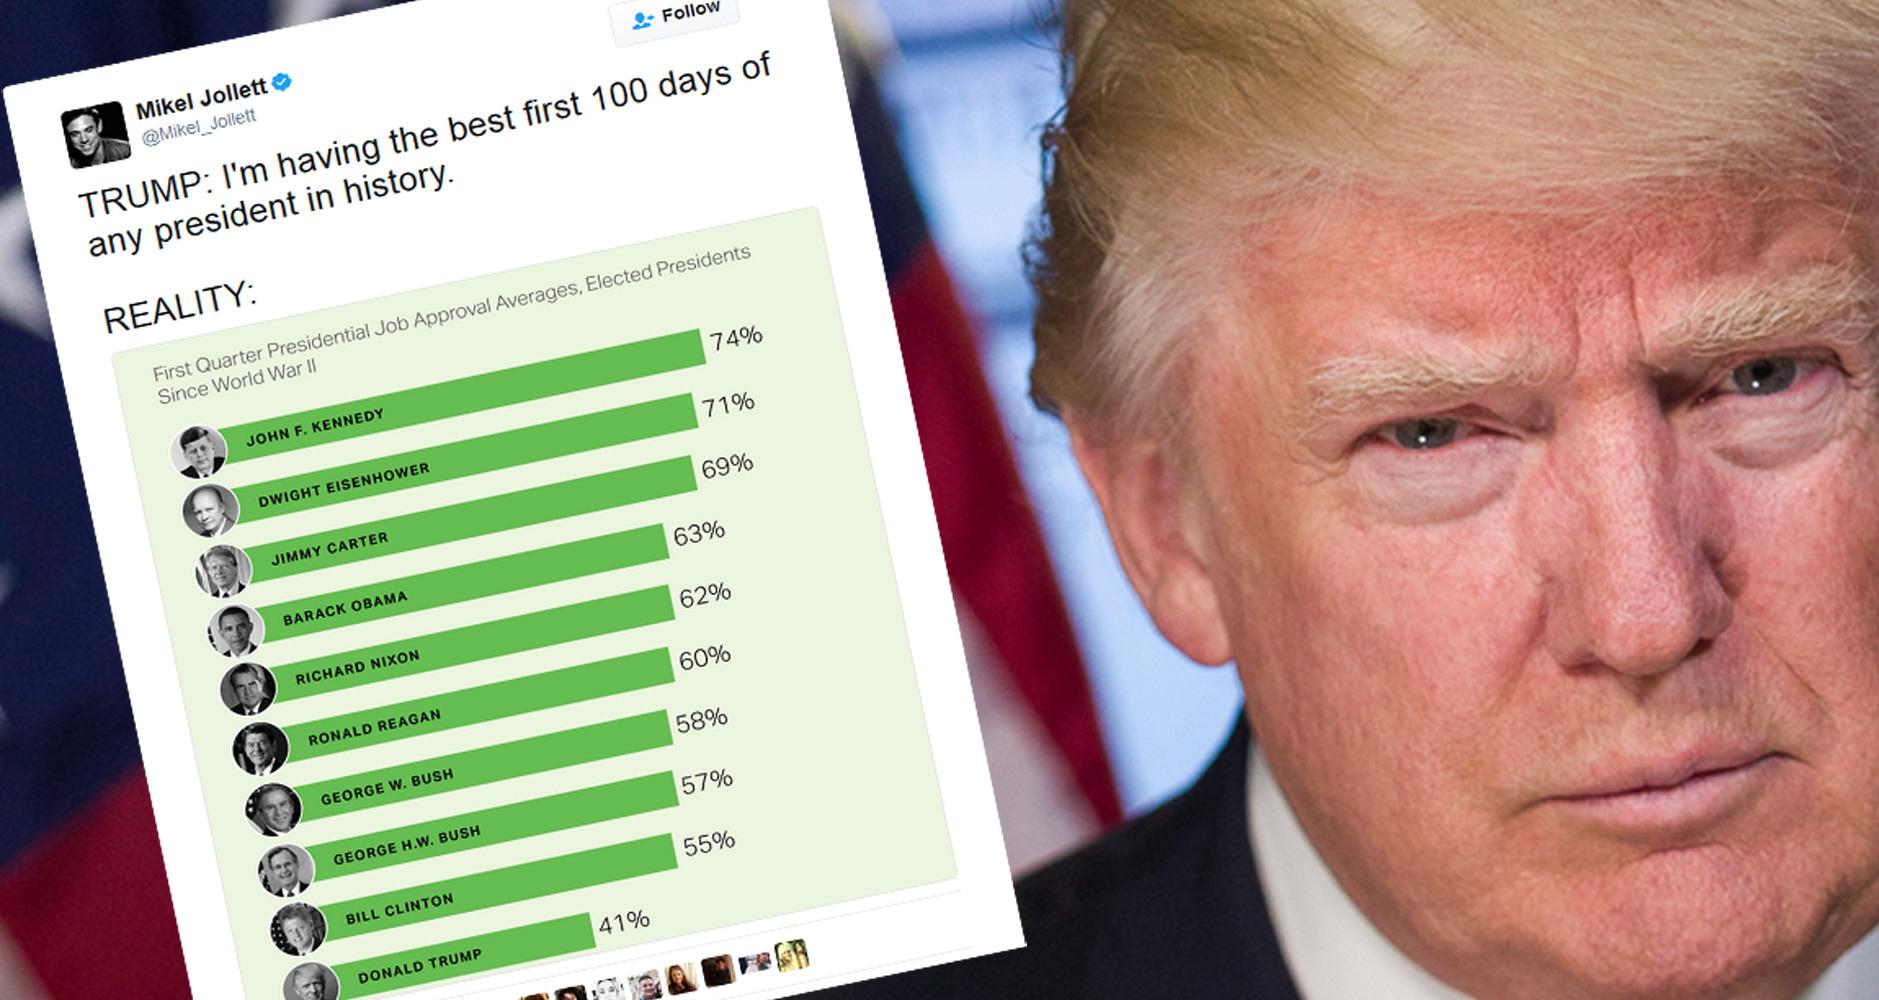 Trump Trampled On Twitter